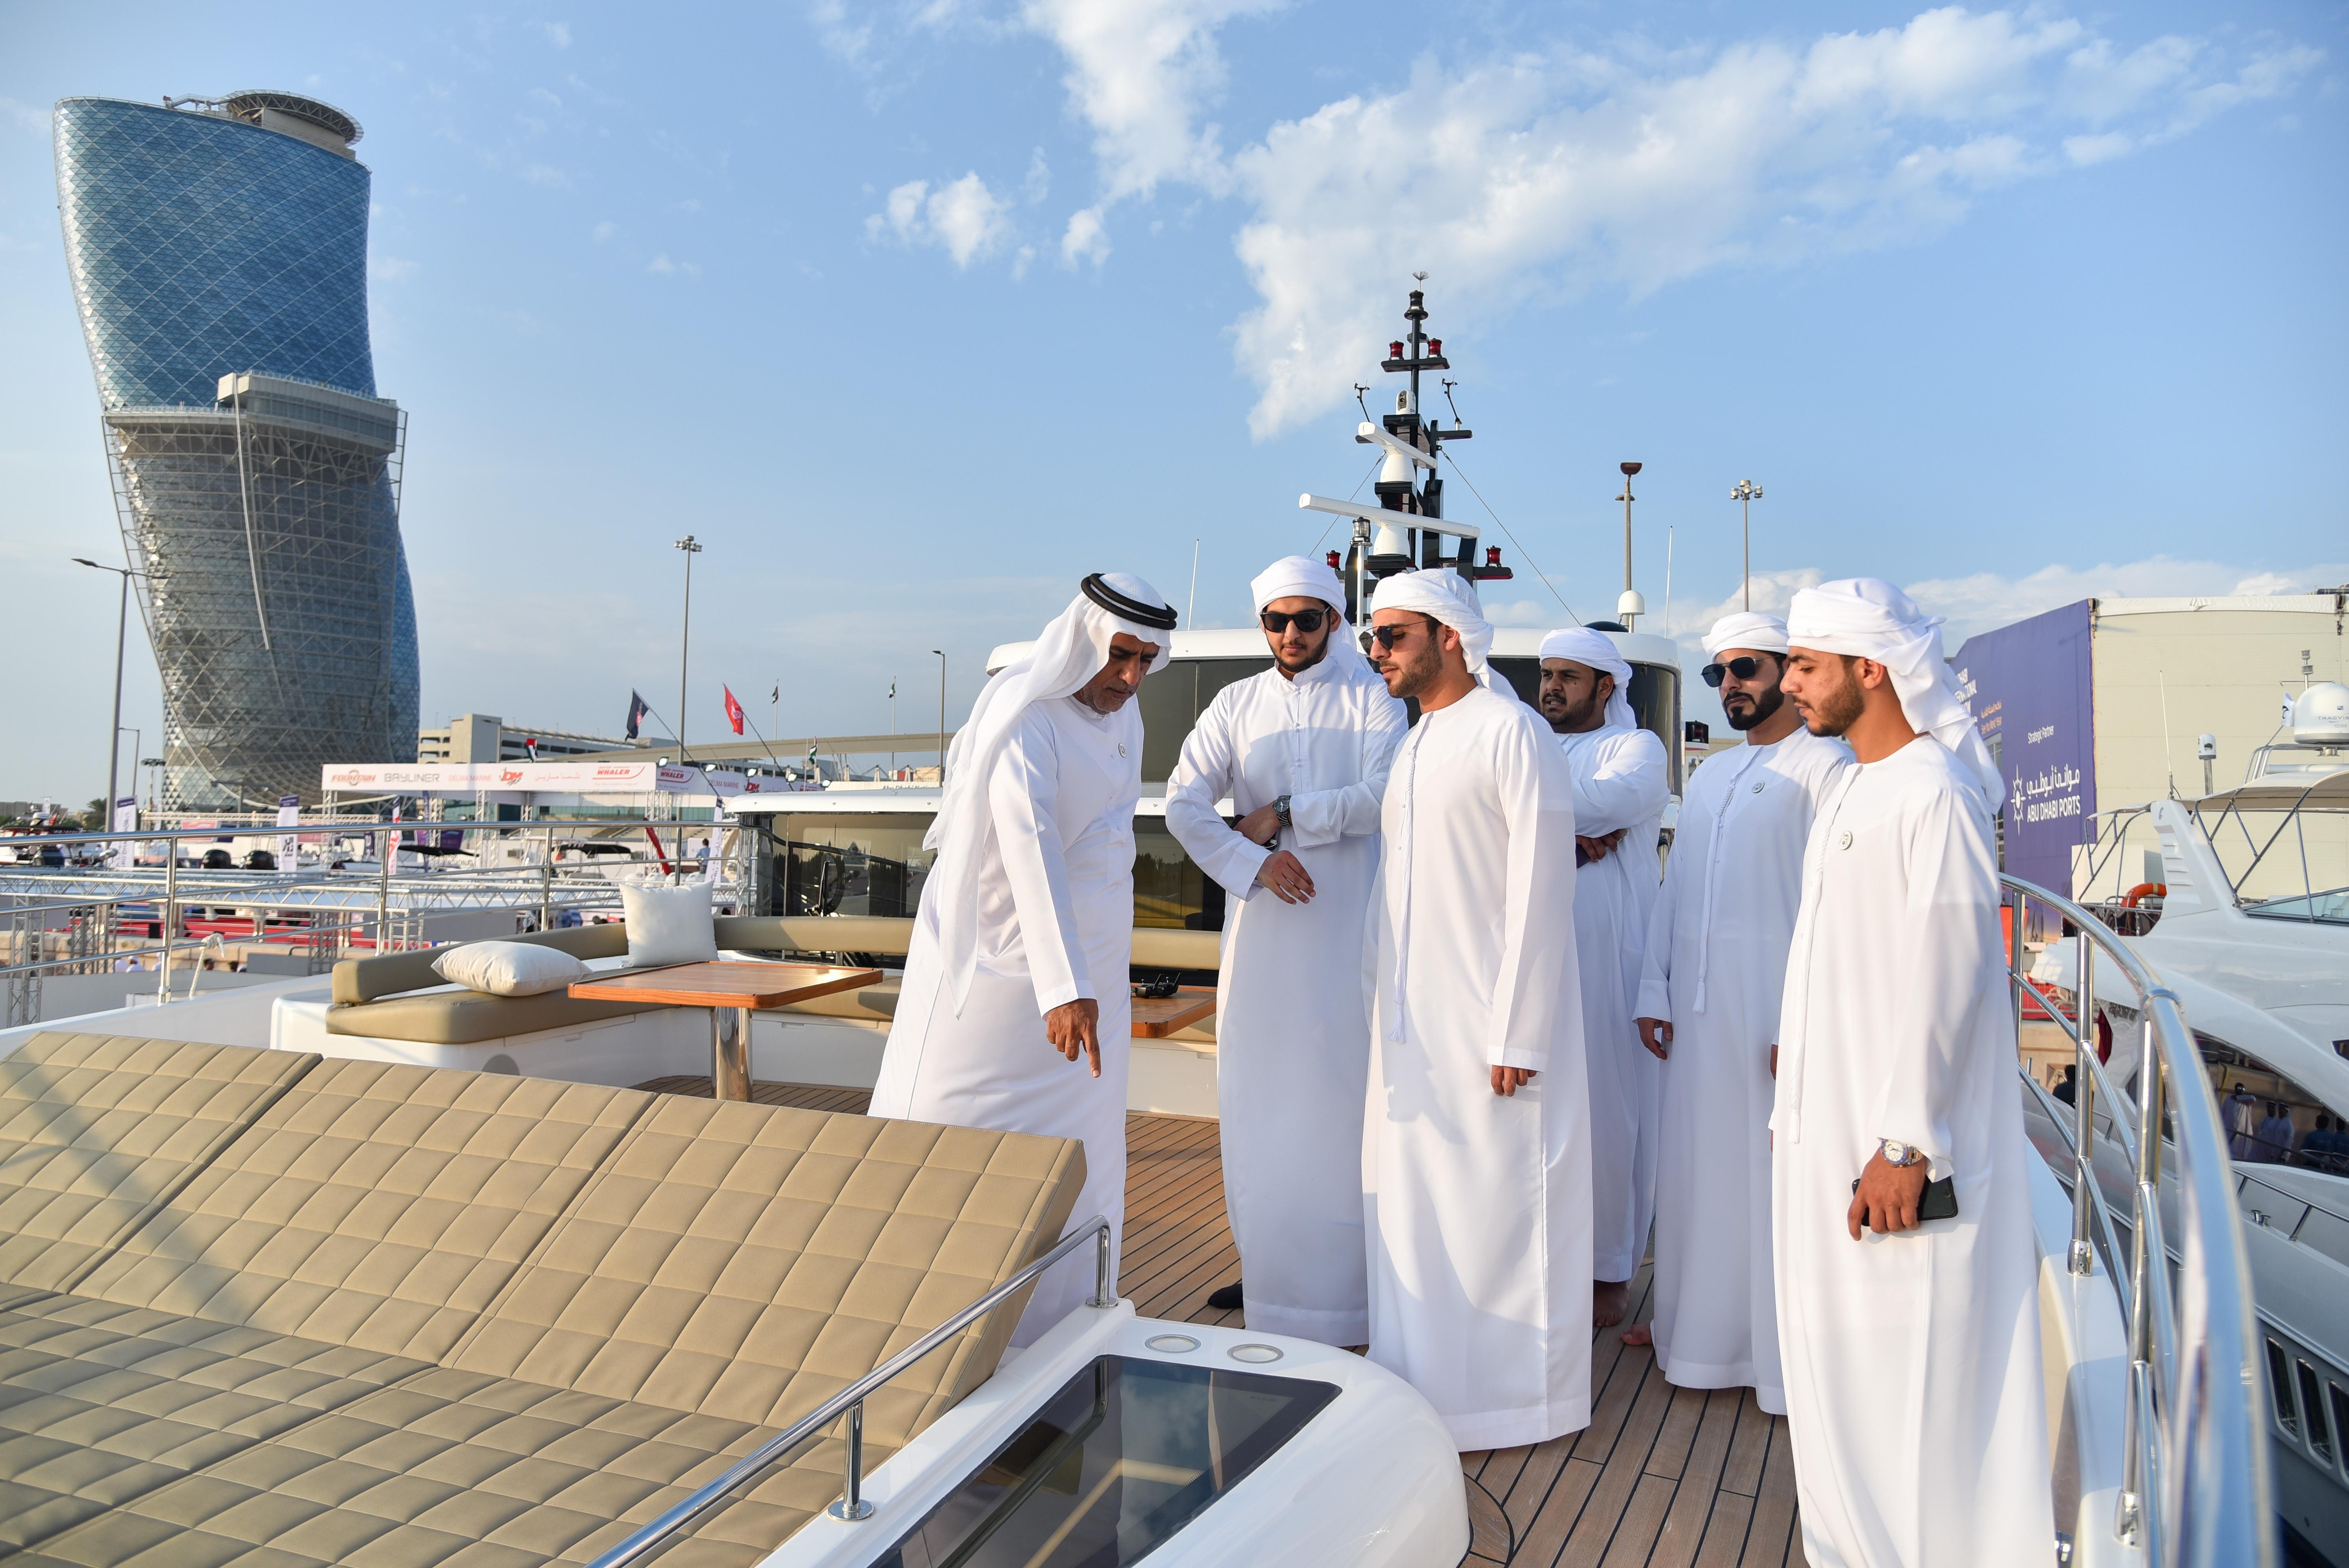 Gulf Craft at Abu Dhabi Boat Show 2018 Day 3 (9).jpg